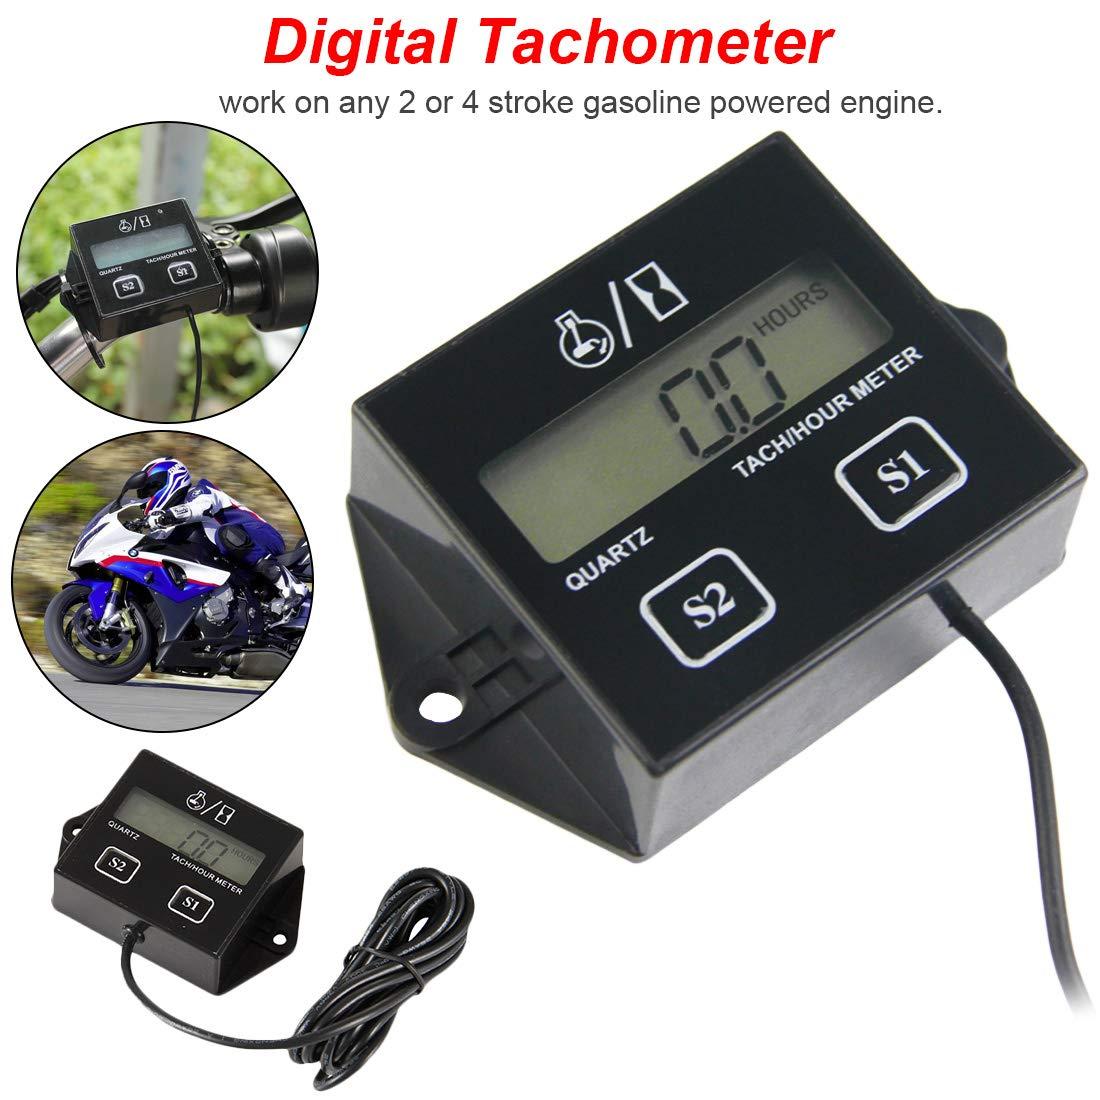 Digital Engine Tach Hour Meter Tachometer Gauge Inductive Display For Motorcycle Motor Marine Boat